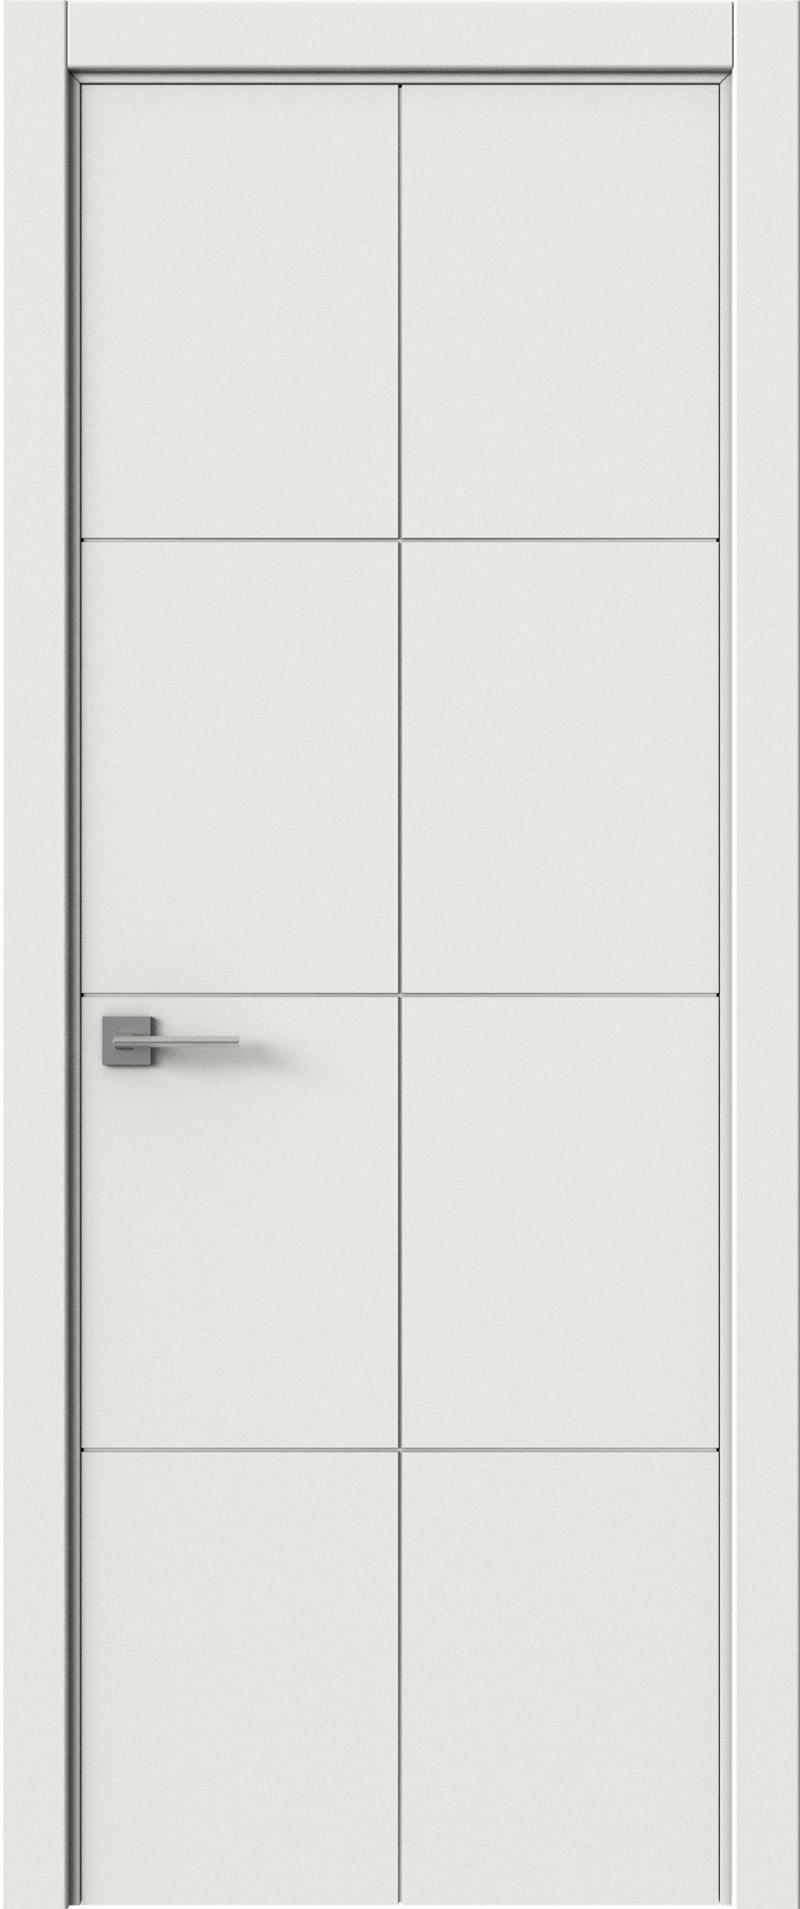 Tivoli Л-2 цвет - Белая эмаль (RAL 9003) Без стекла (ДГ)